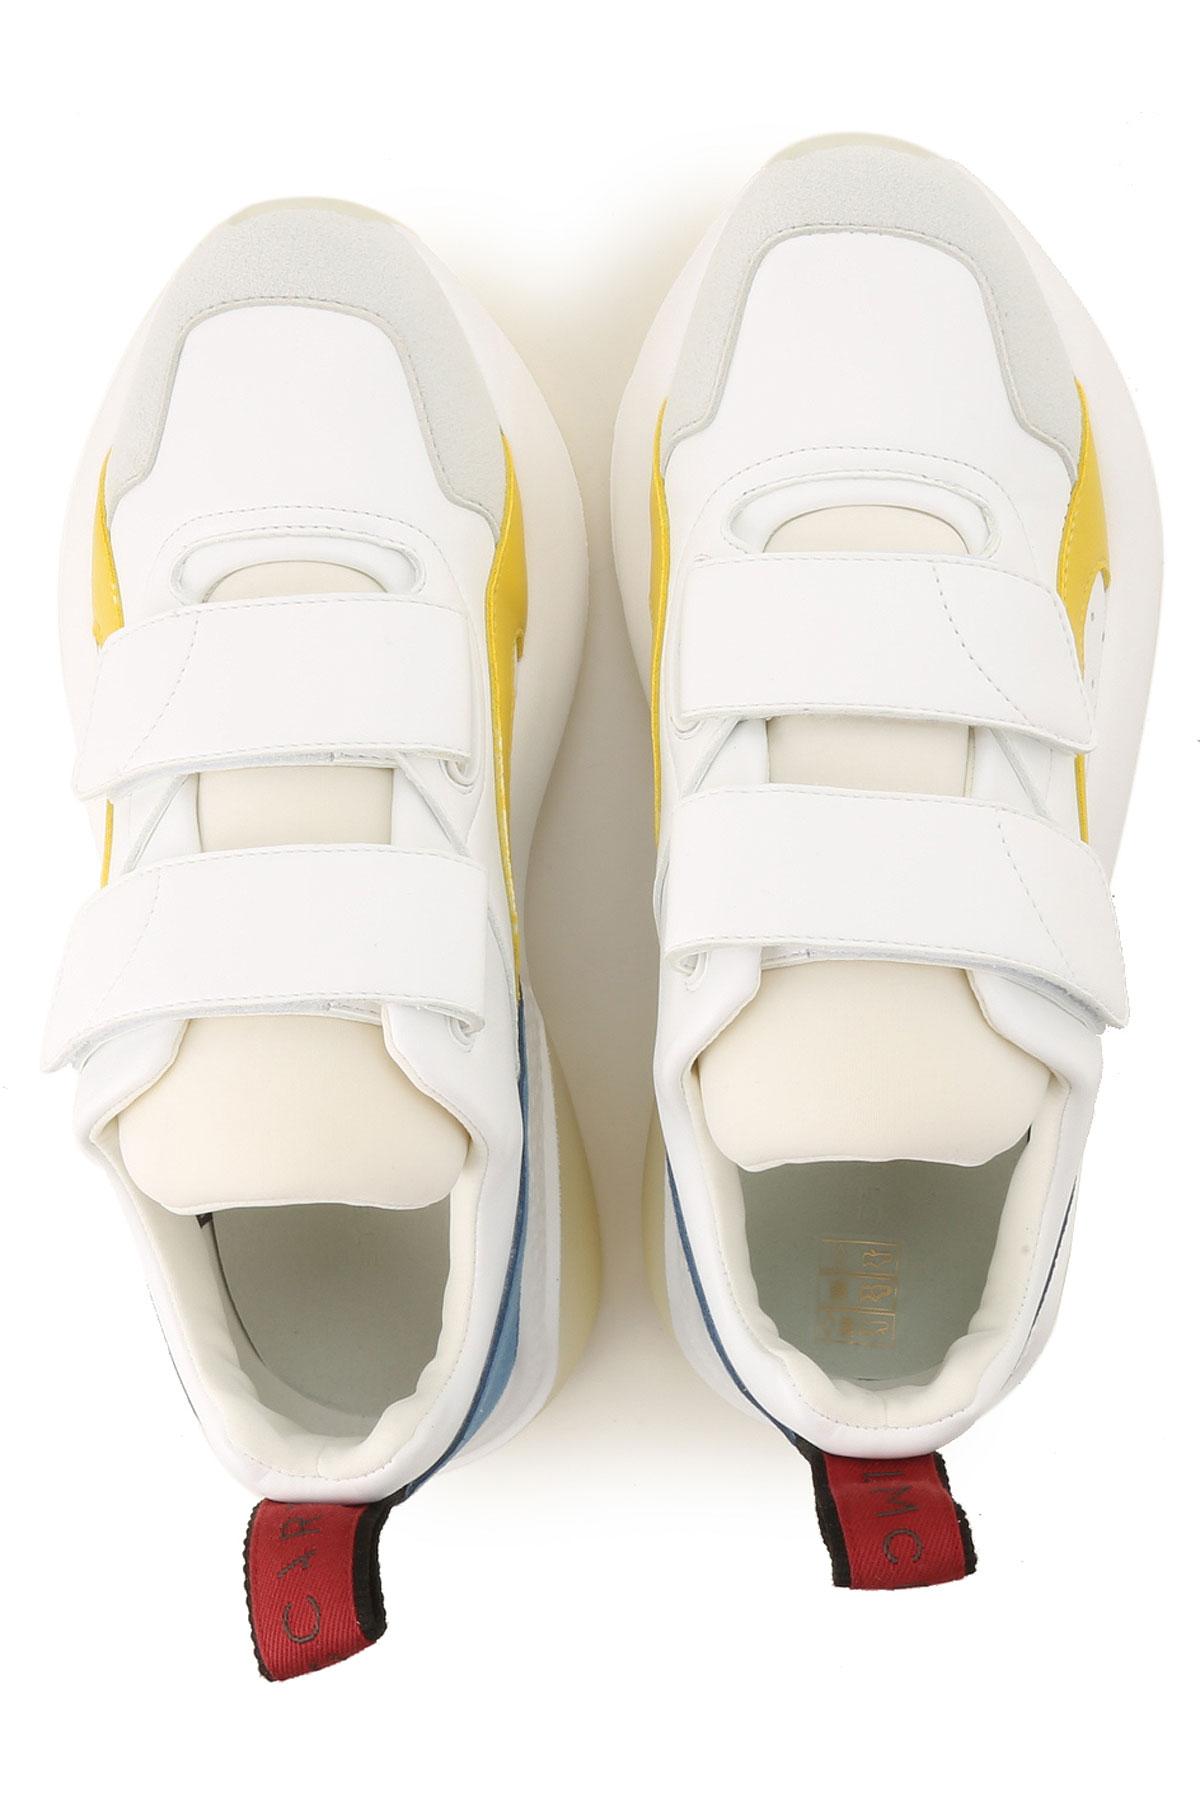 Scarpe Donna Sneakers Stella Mccartney Offerte Limitate